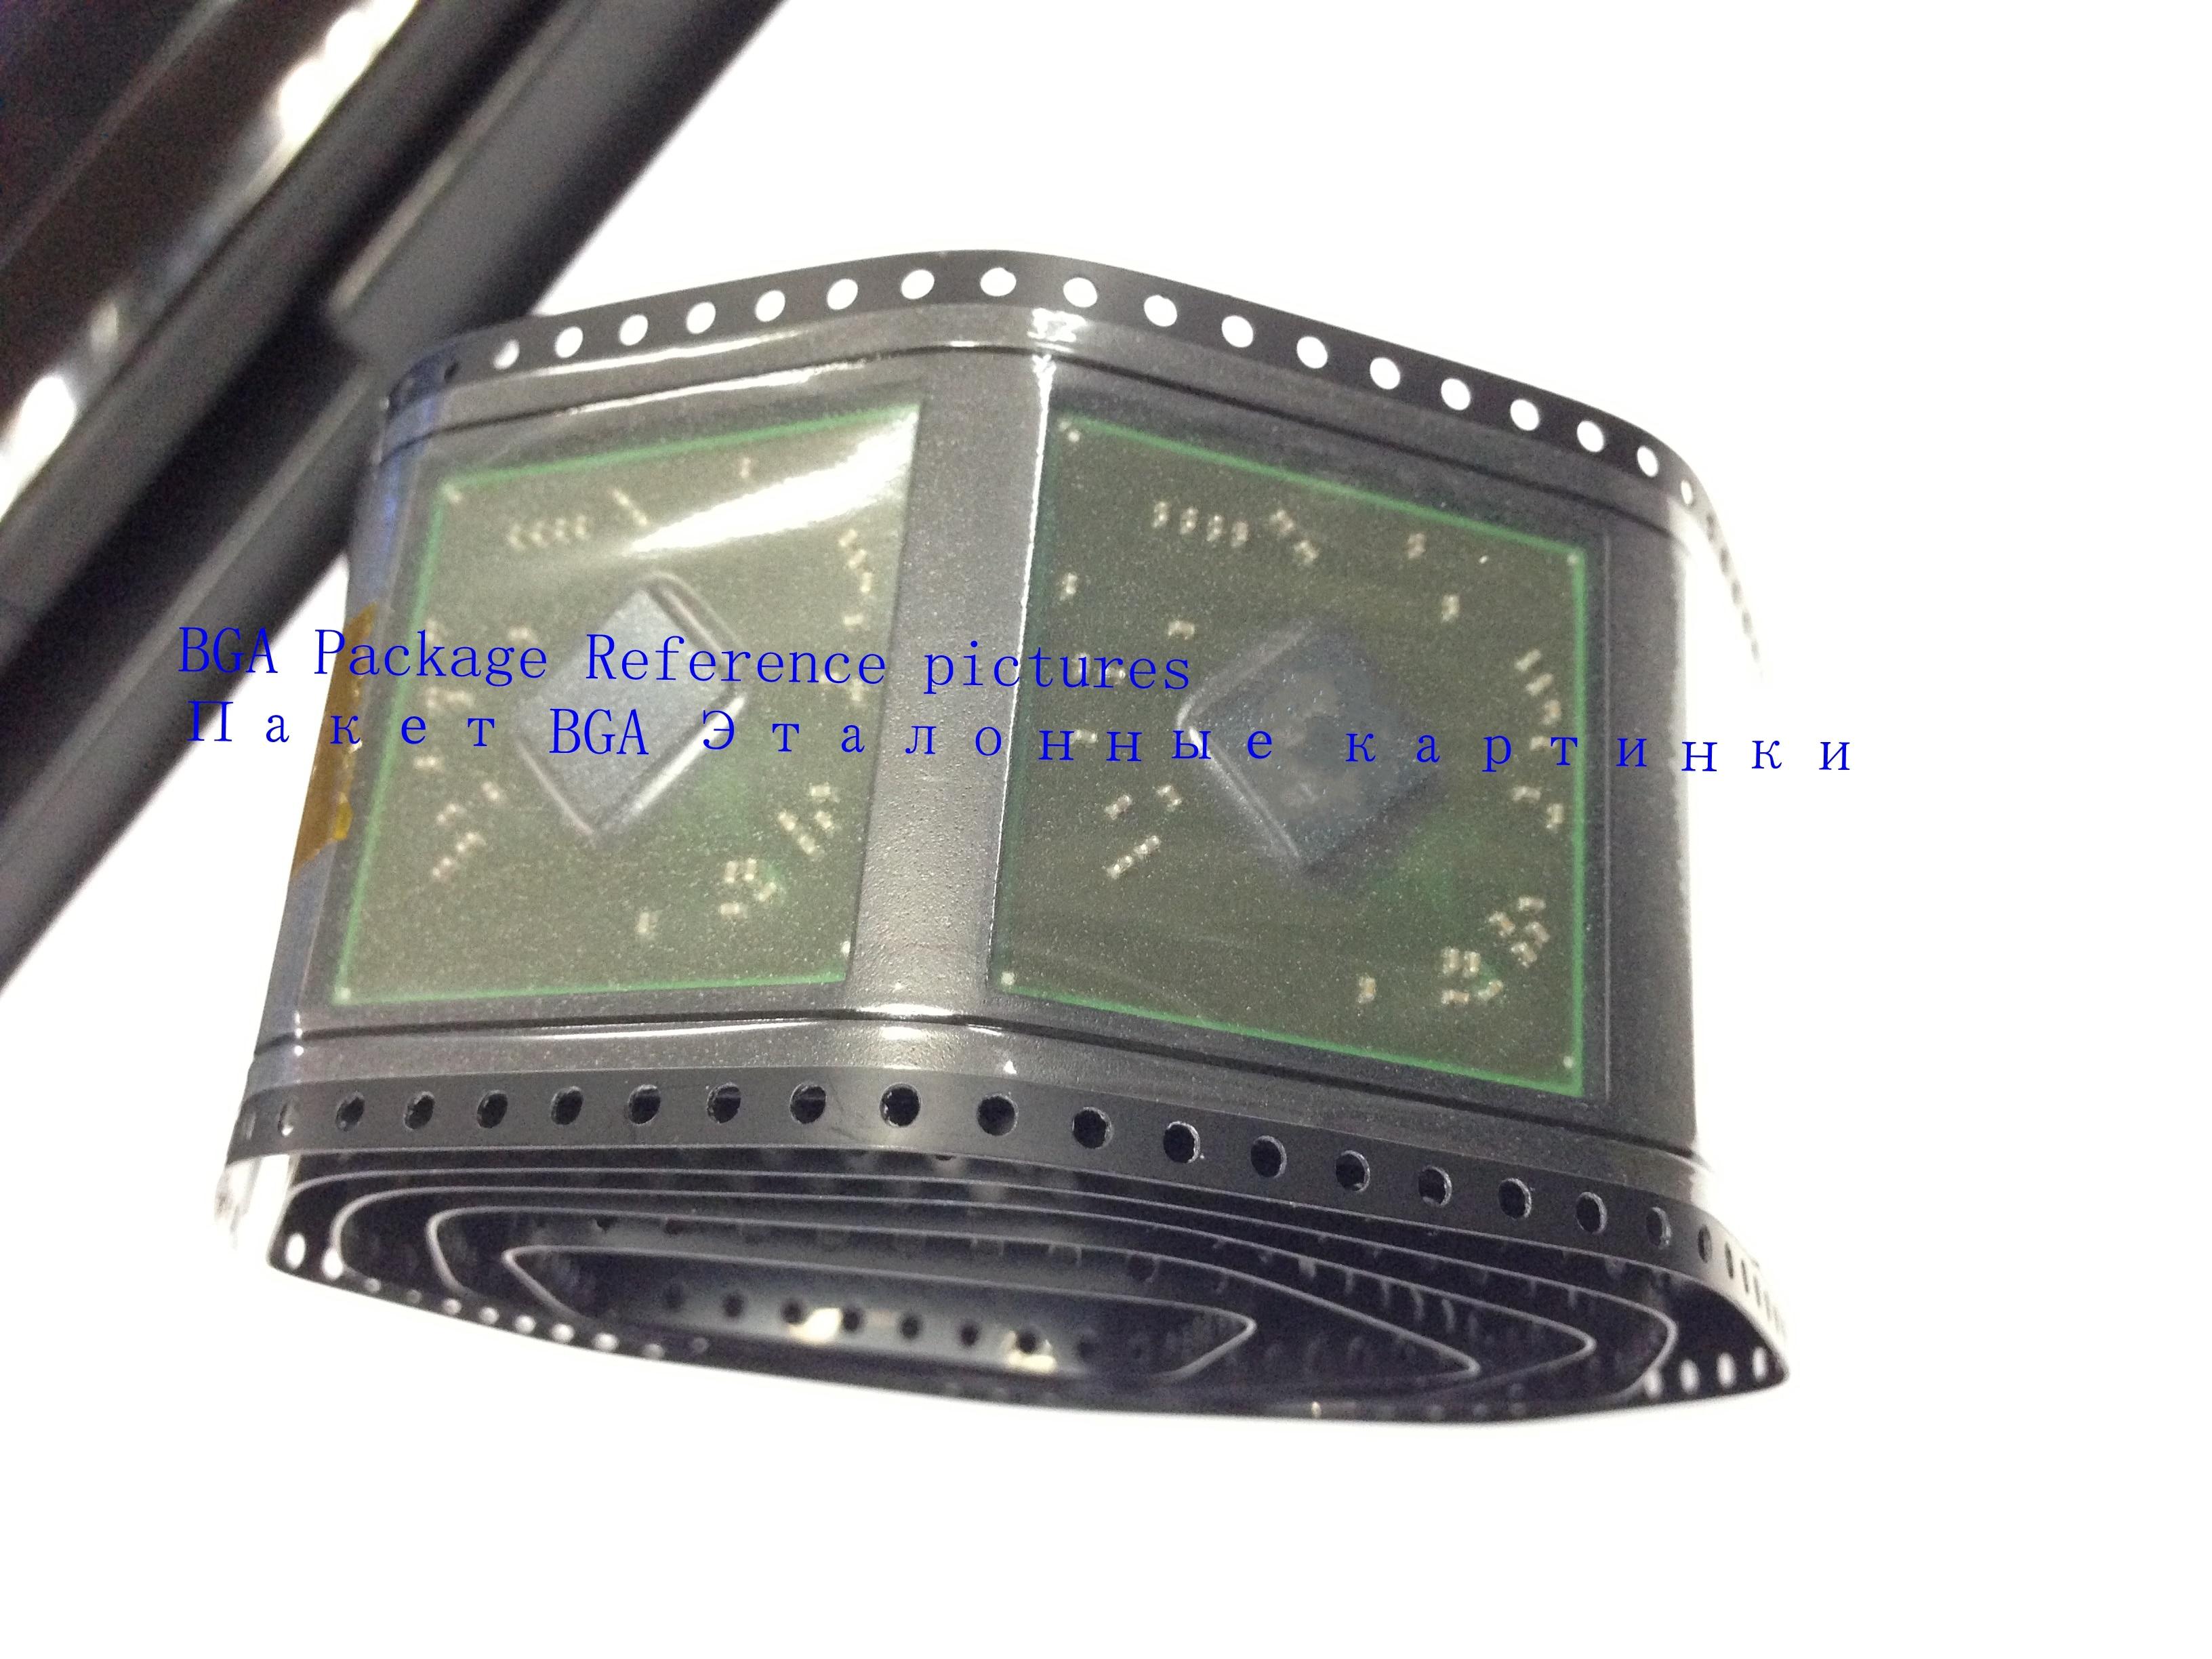 1pcs/lot 100% New N14P-GE-OP-A2 N14P GE OP A2 BGA Chipset1pcs/lot 100% New N14P-GE-OP-A2 N14P GE OP A2 BGA Chipset